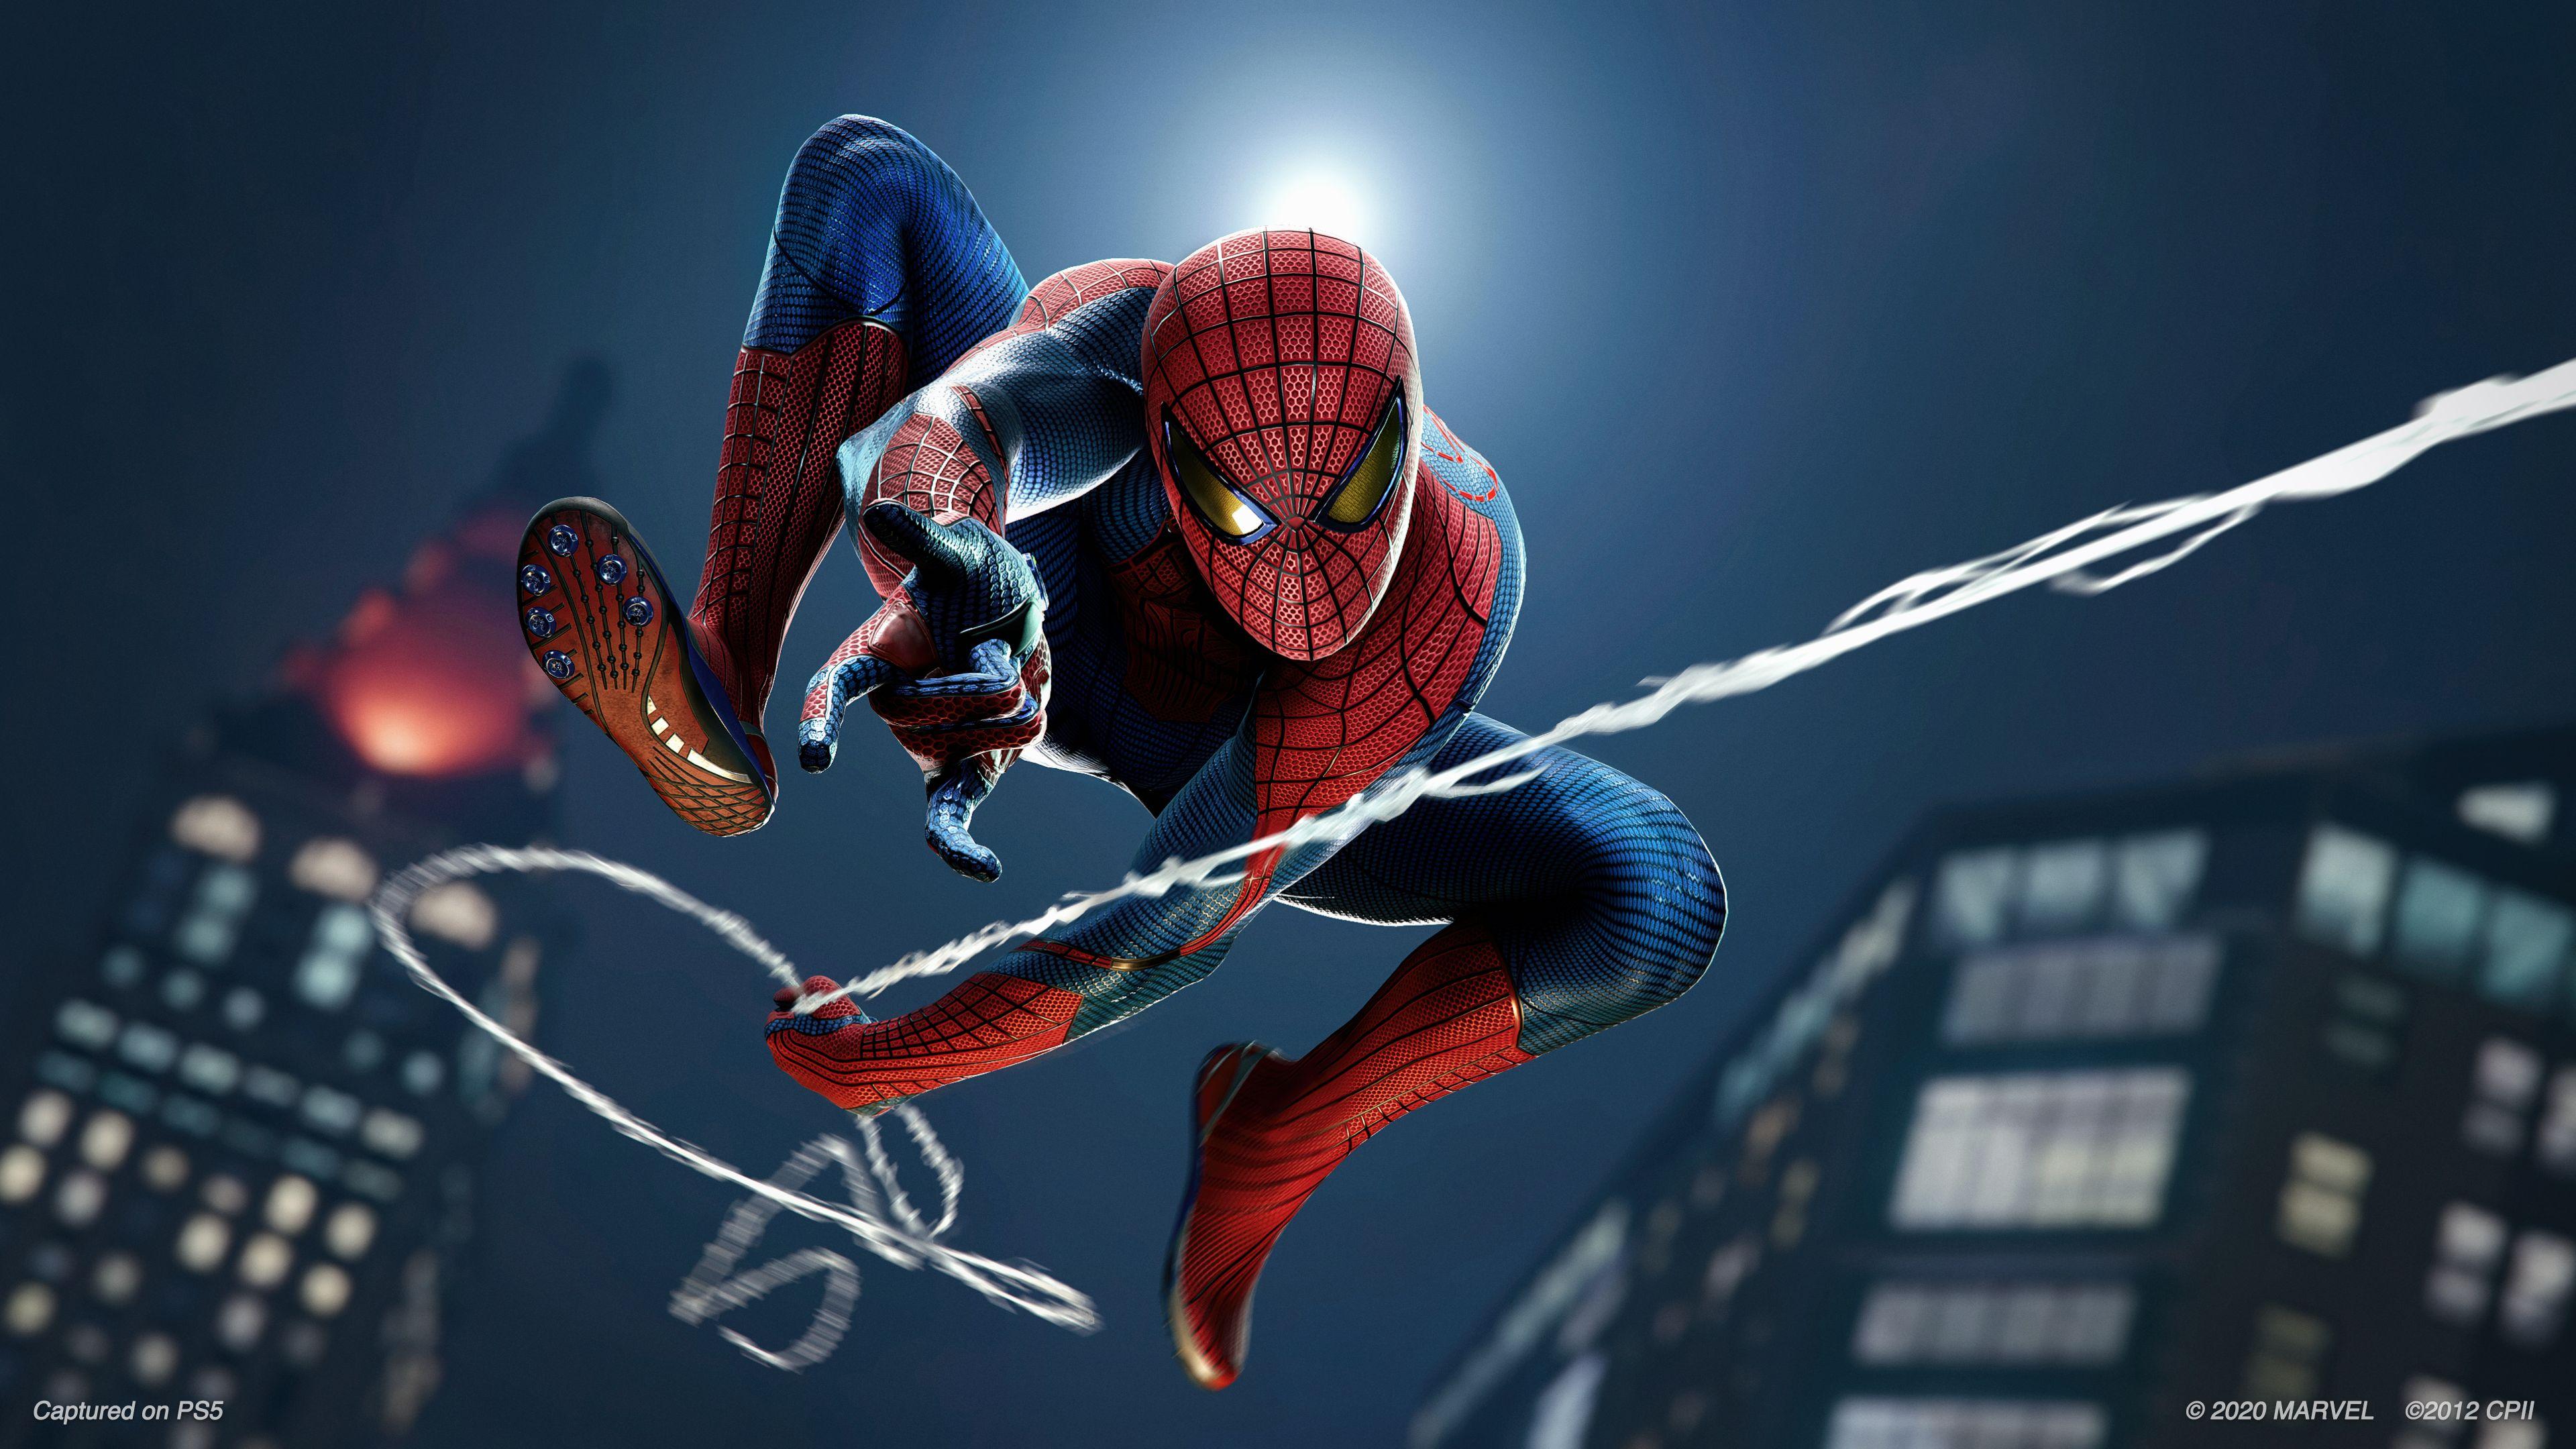 Marvel S Spider Man 4k Wallpaper Remastered Playstation 5 2020 Games Games 2886